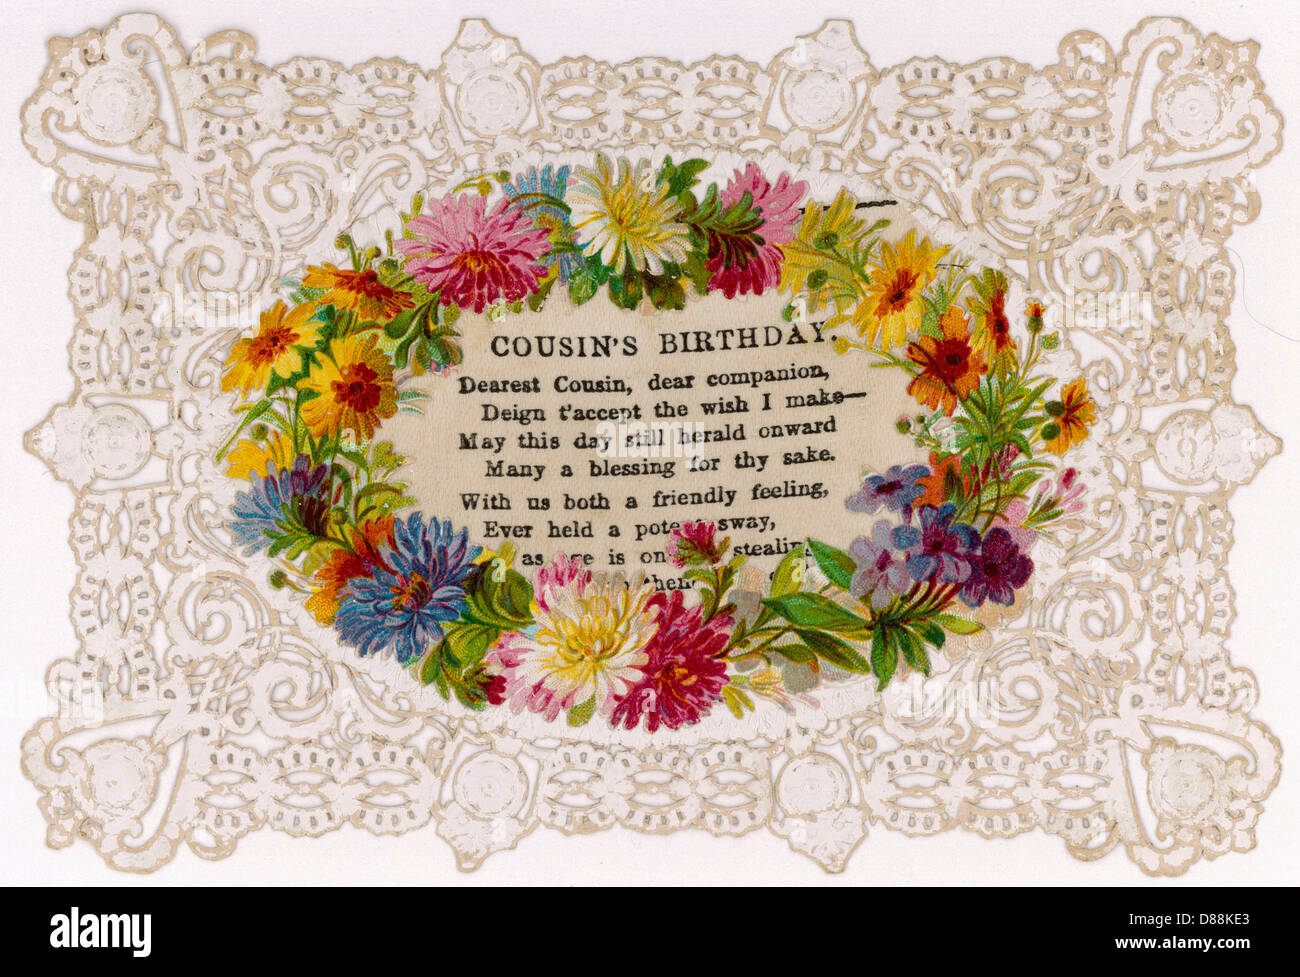 Birthday Card Cousins Stock Photo 56739259